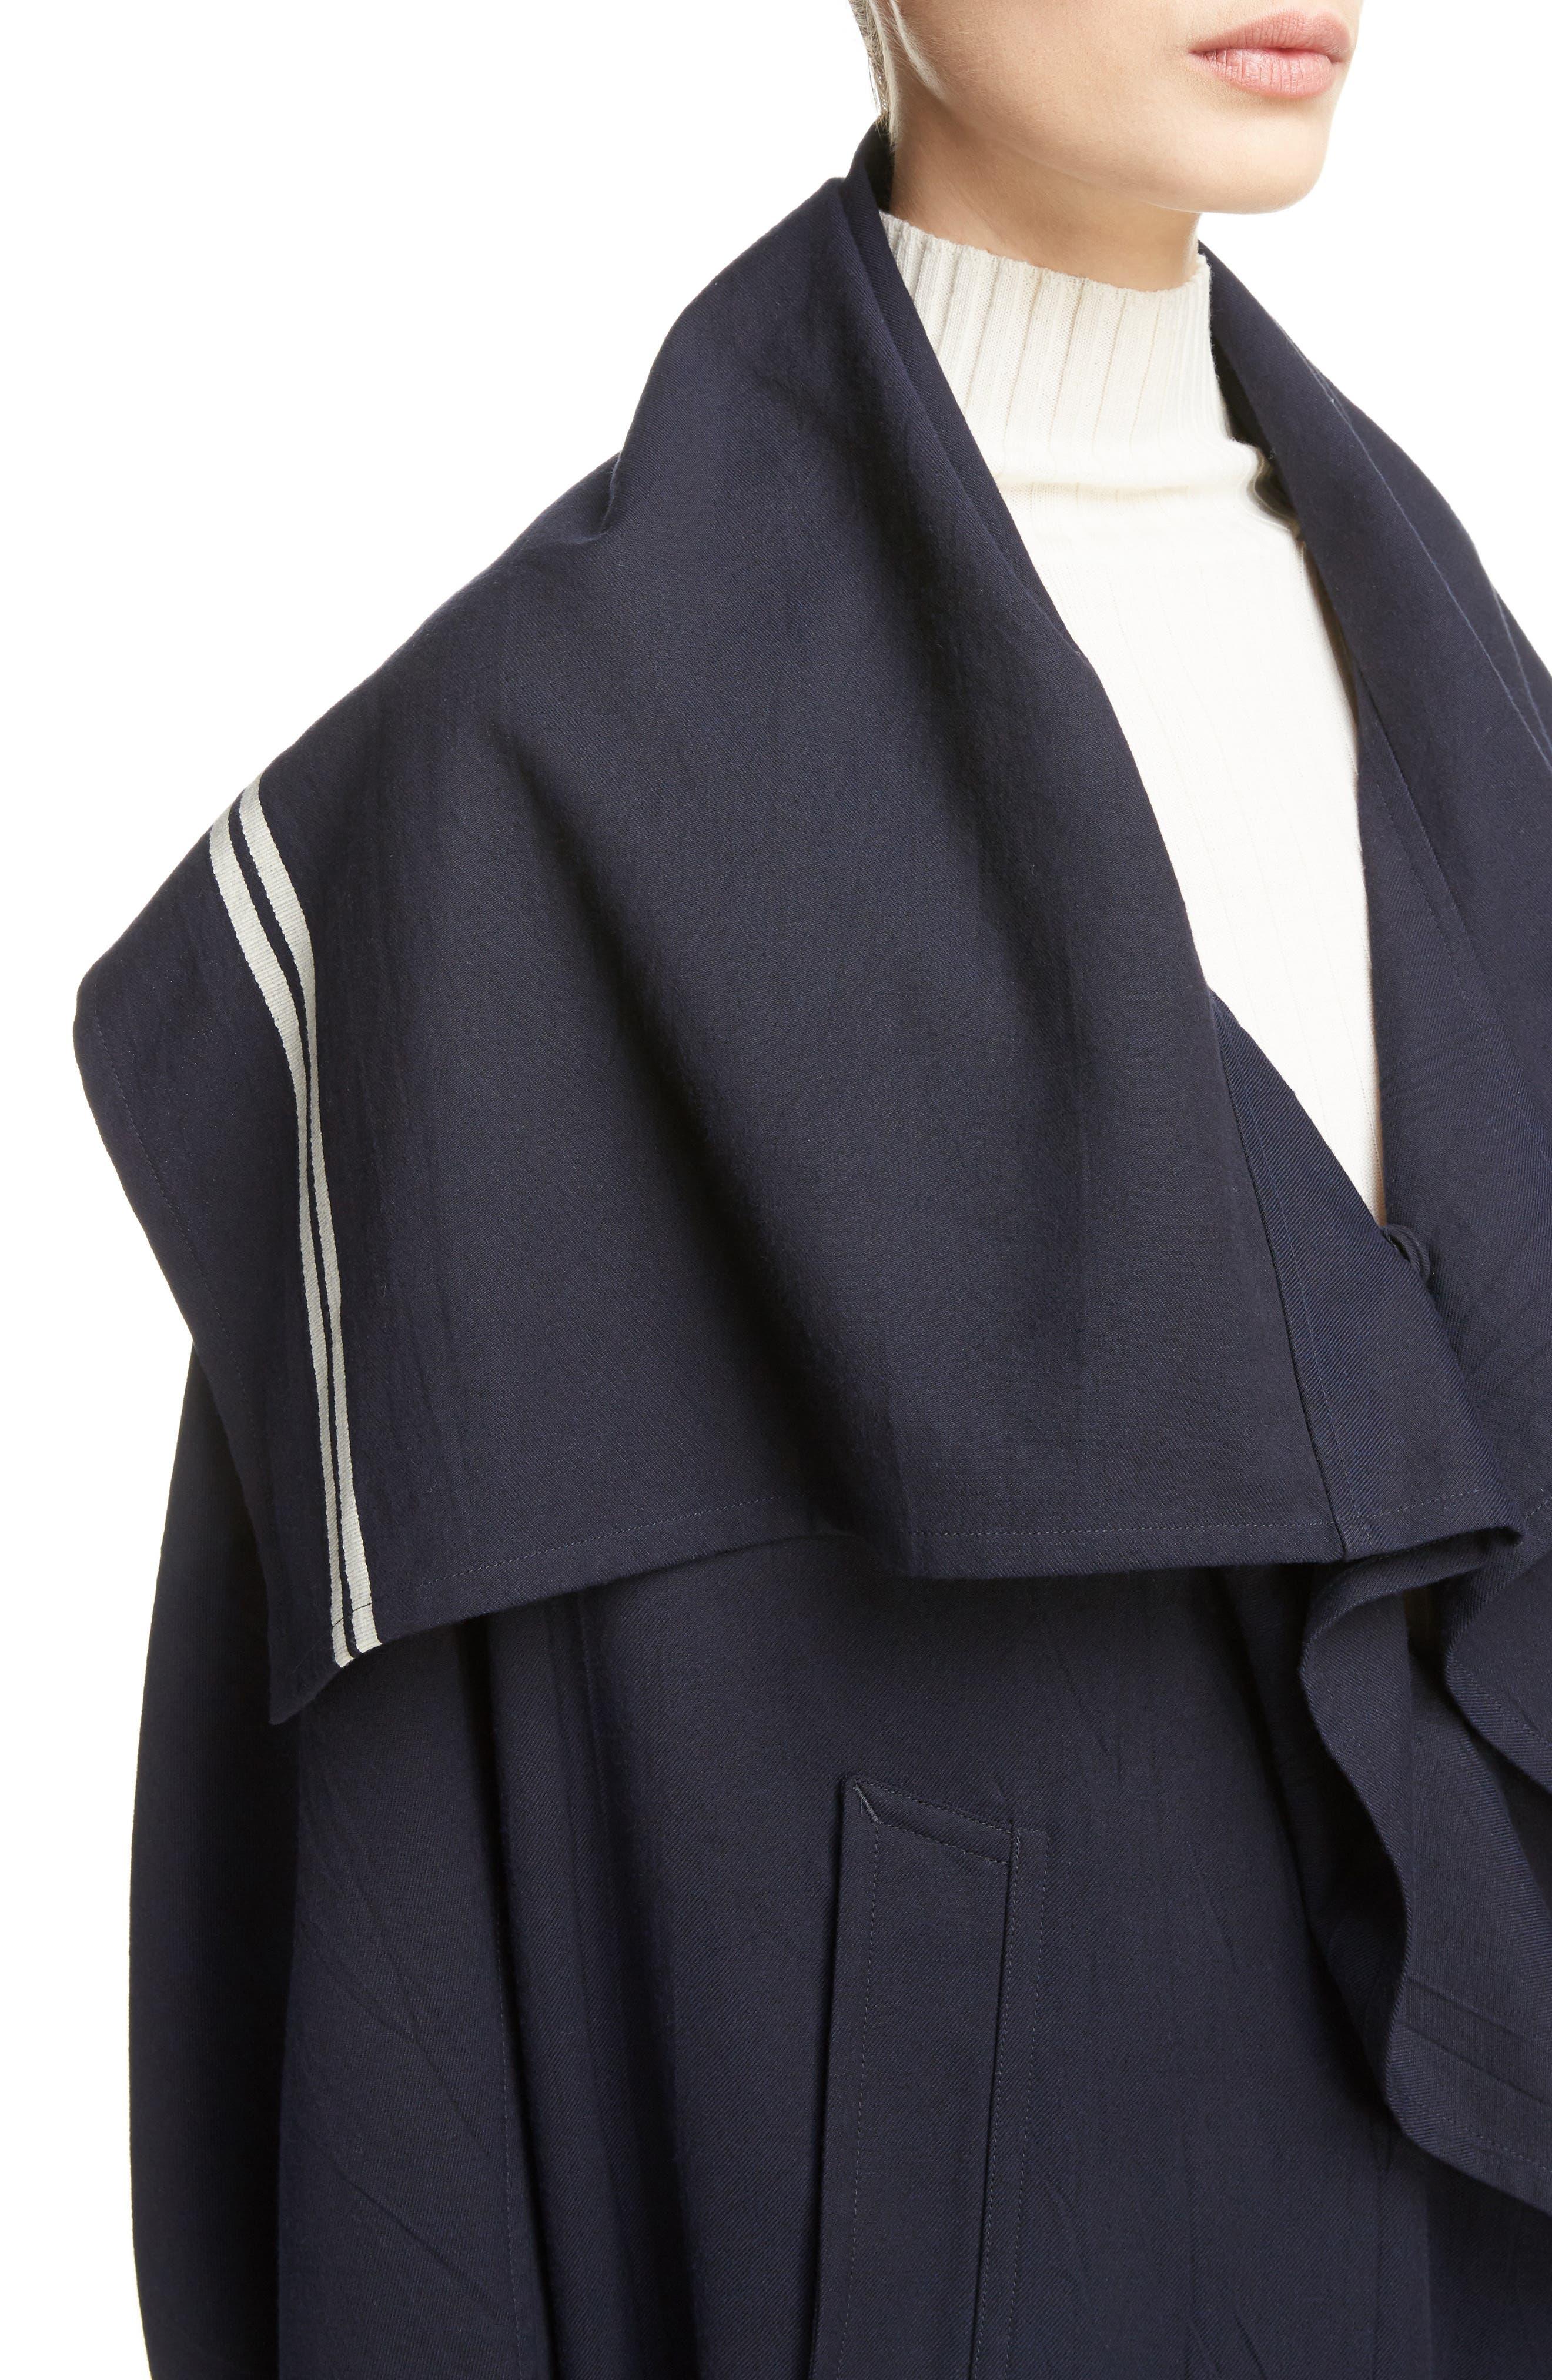 Drape Collar Coat,                             Alternate thumbnail 3, color,                             410